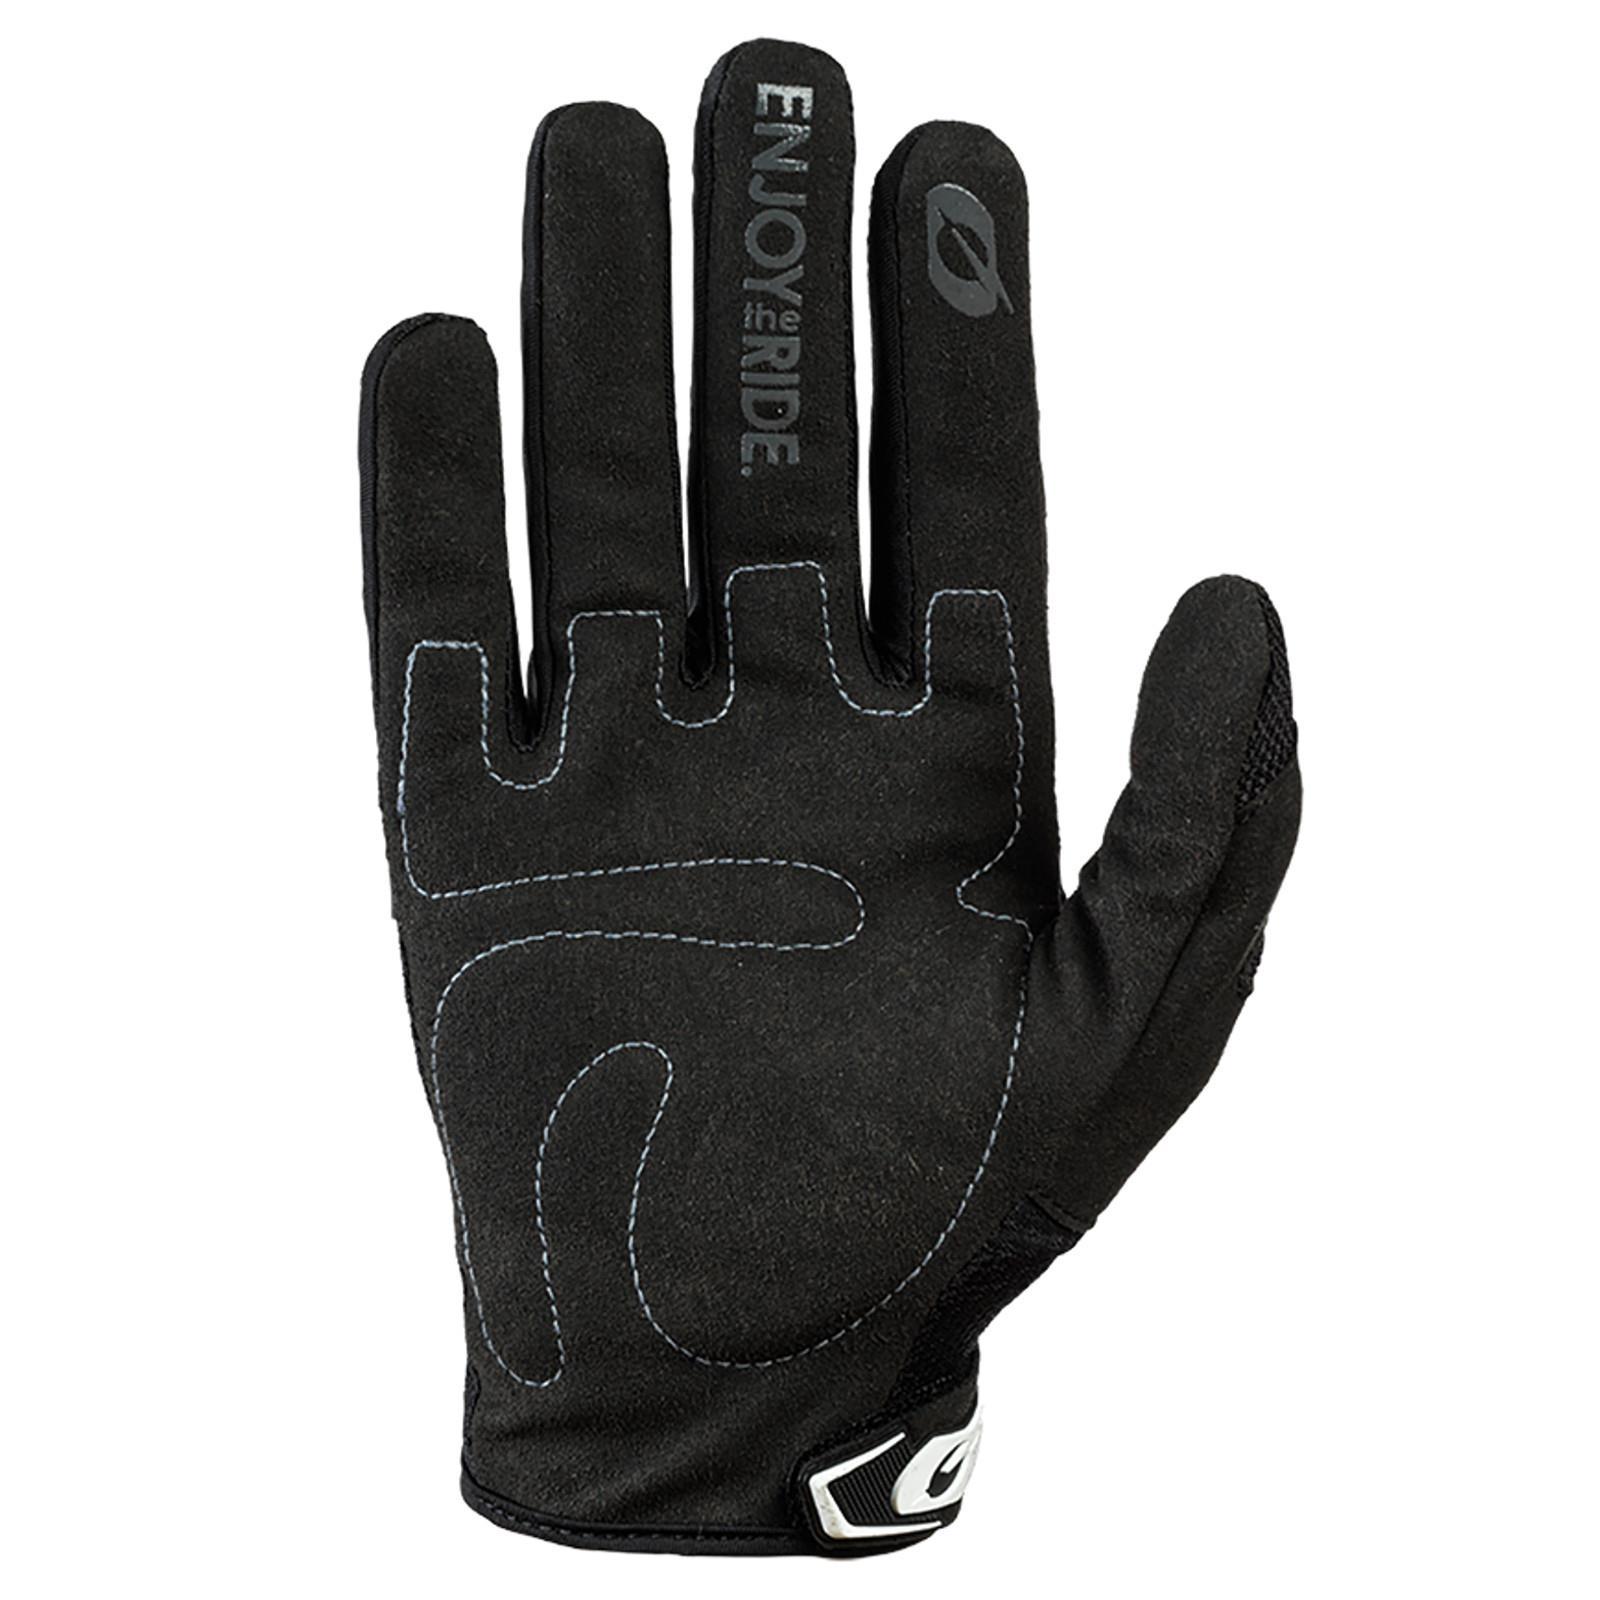 Indexbild 20 - O'Neal Herren Handschuhe Element Motocross Mountainbike Downhill Fahrrad MTB MX